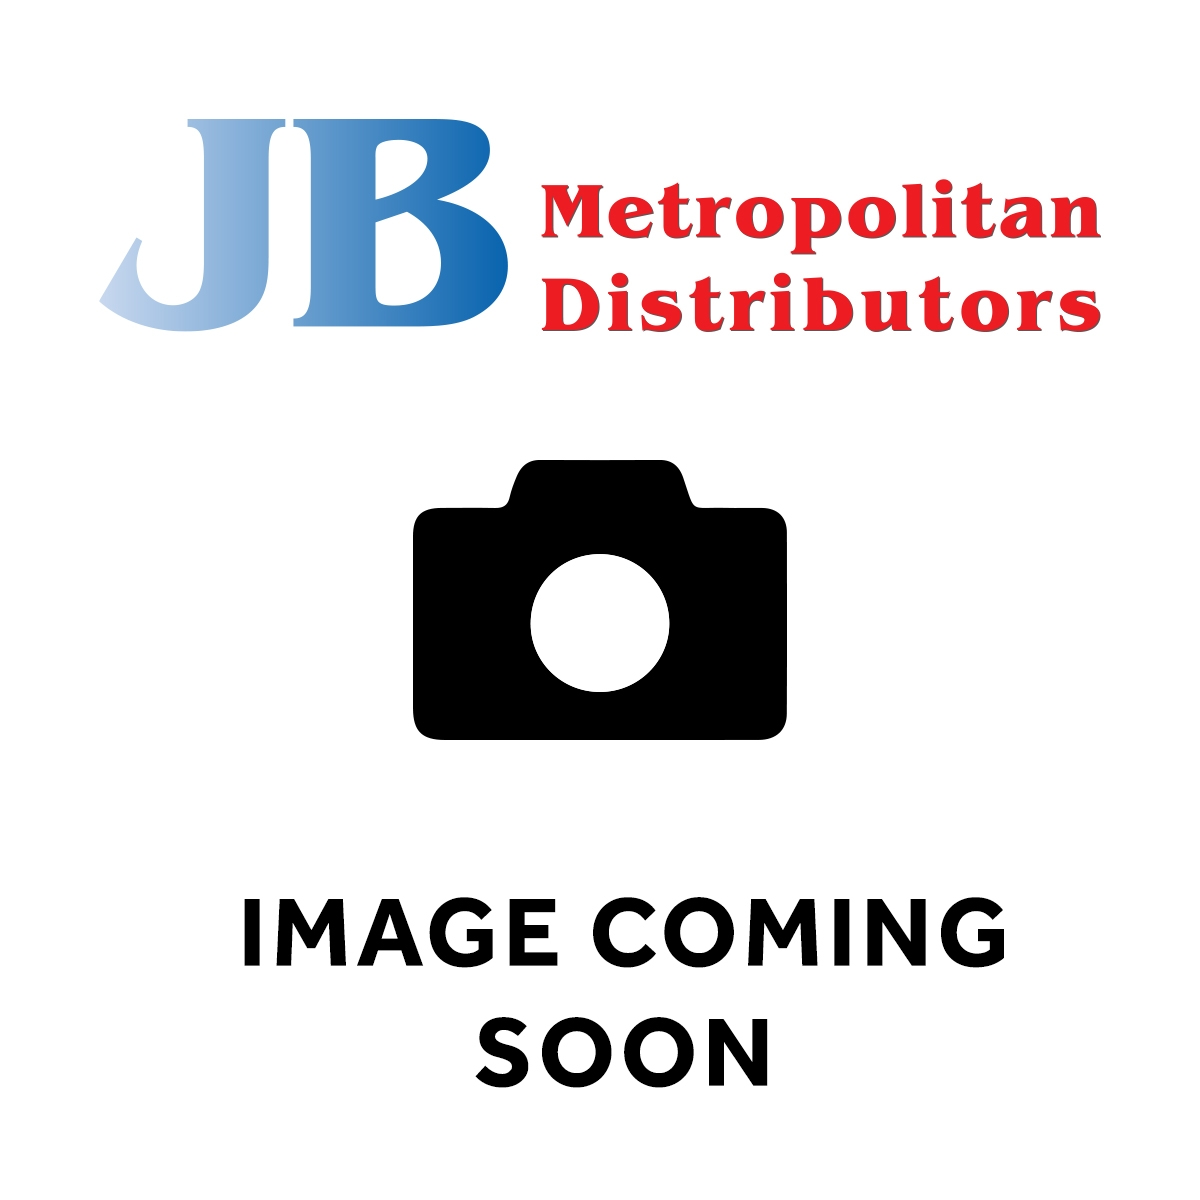 GOOD TEMPTATIONS MUFNUTZ 2PK 90G (8)